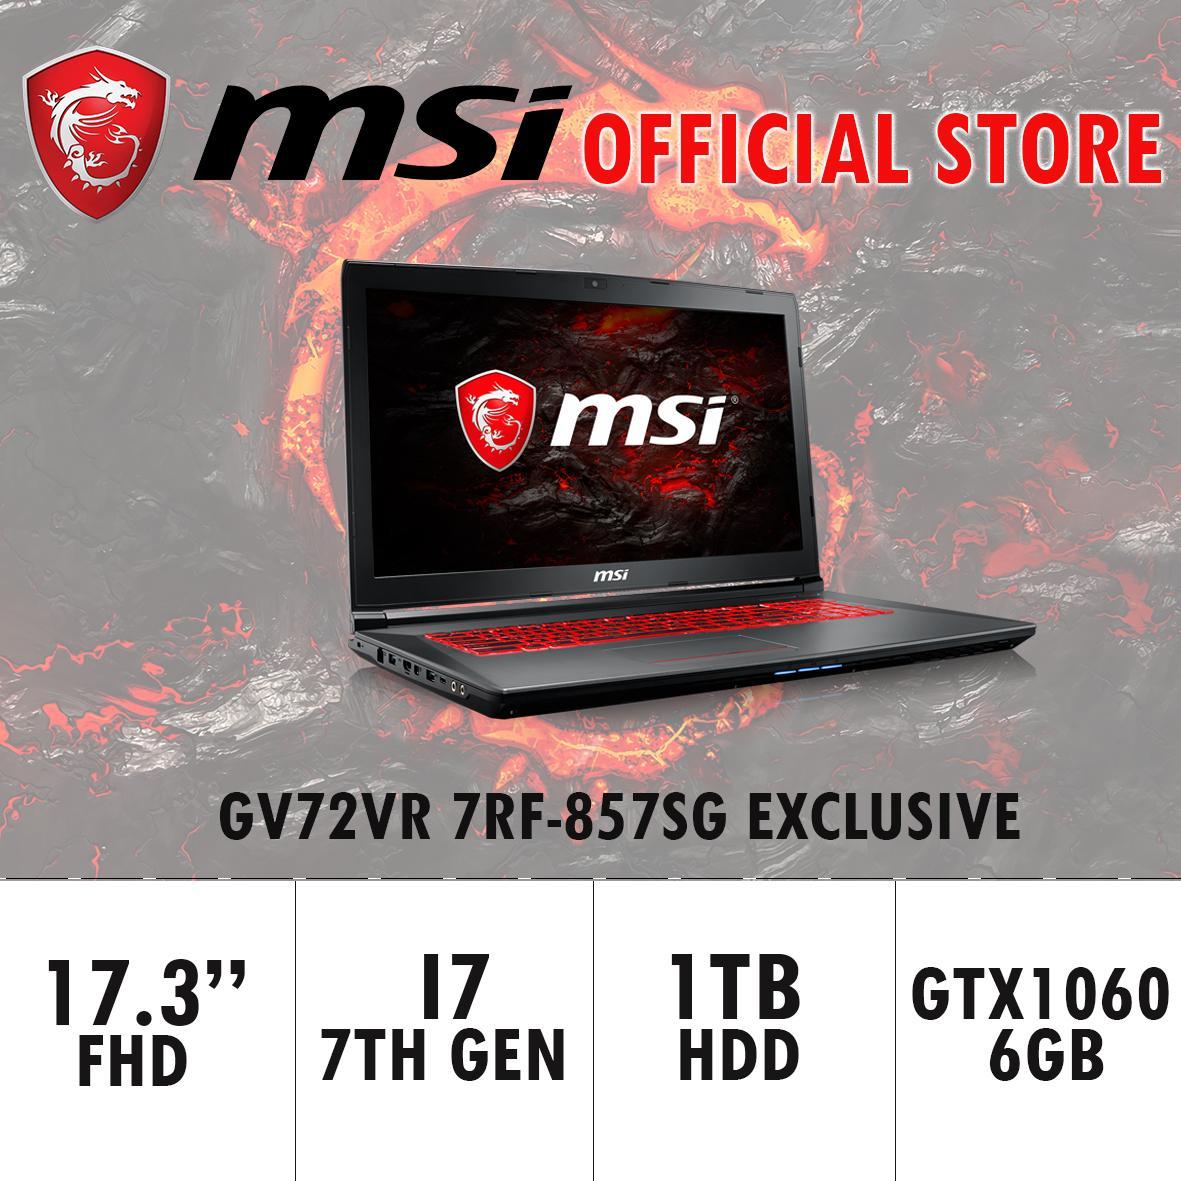 MSI GV72VR 7RF-857SG EXCLUSIVE (I7-7700HQ/8GB DDR4/128GB SSD+1TB HDD 7200RPM/6GB NVIDIA GTX1060) GAMING LAPTOP